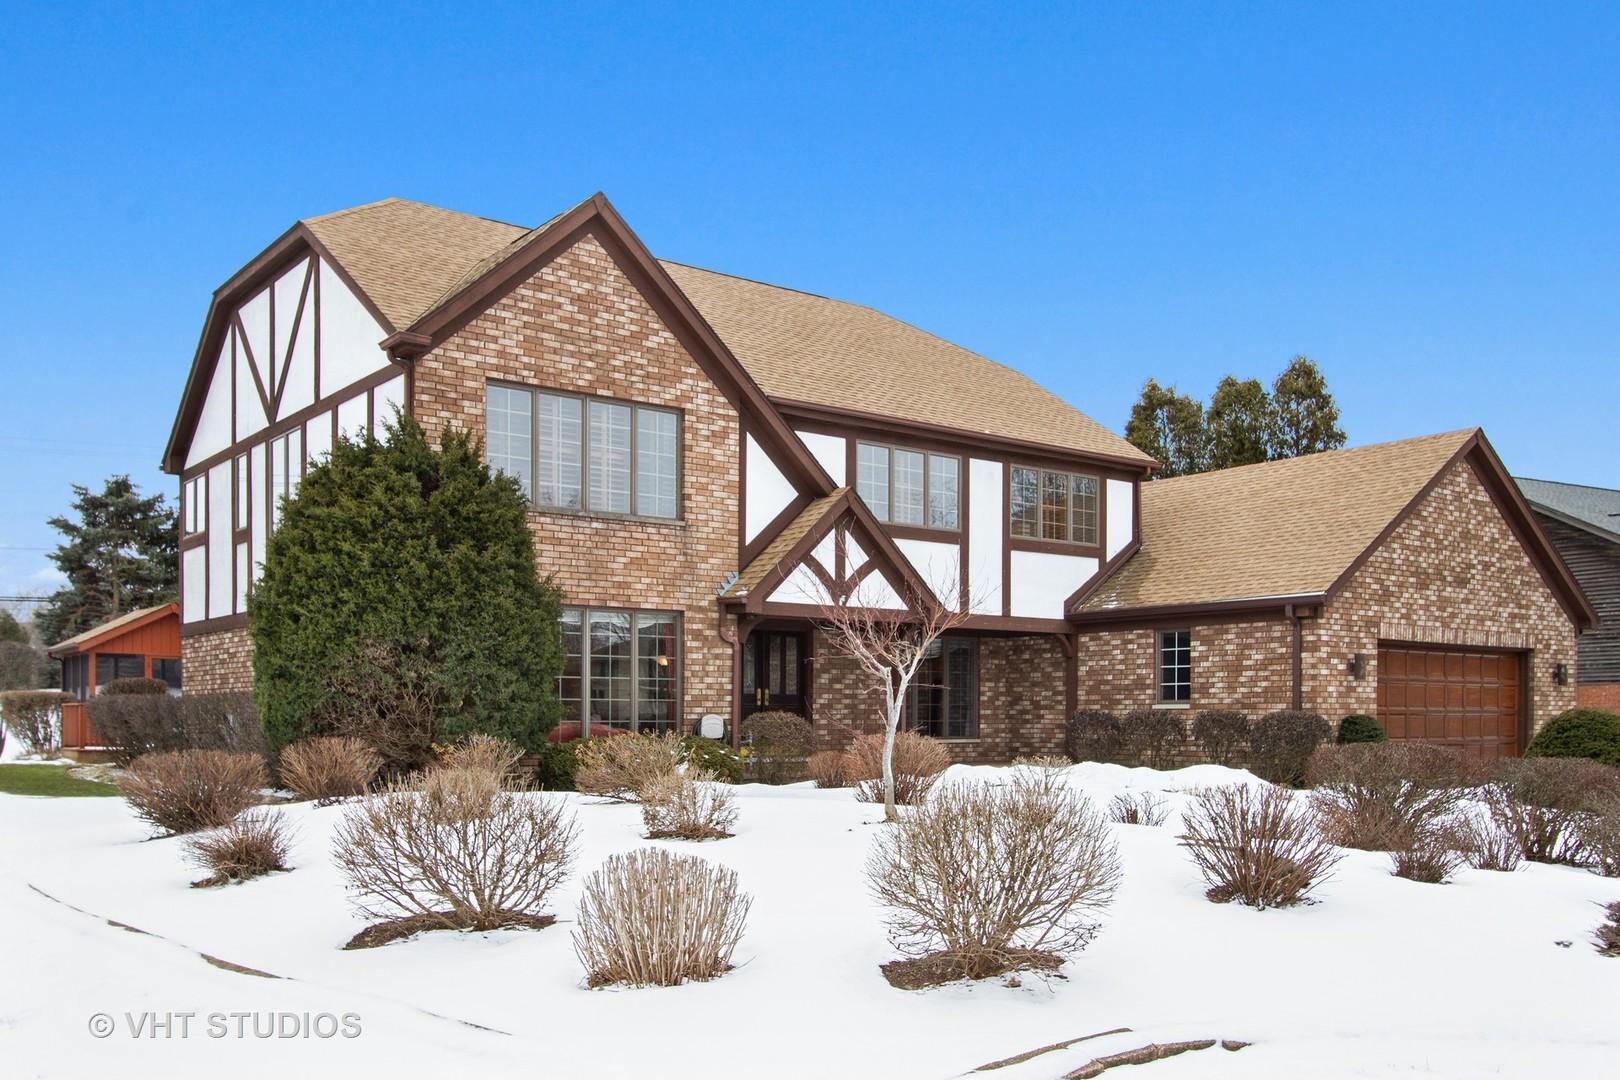 840 Wedgewood ,Buffalo Grove, Illinois 60089